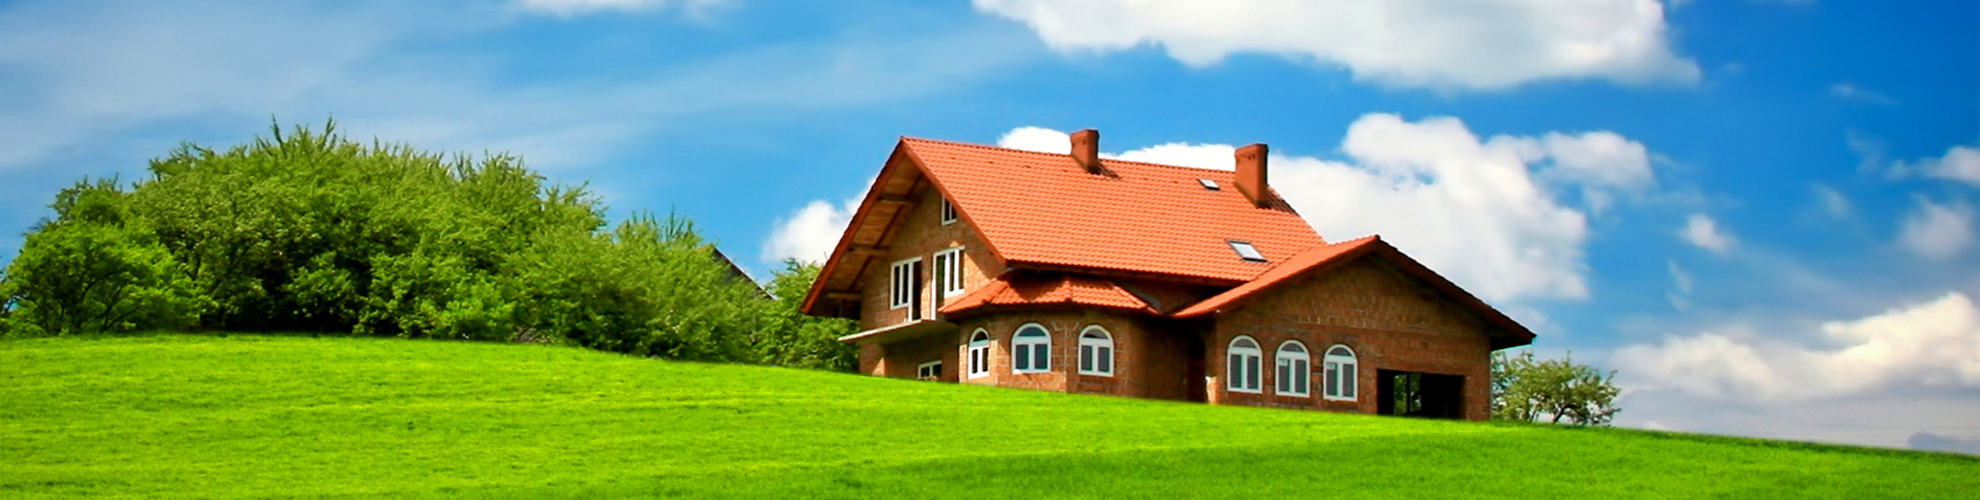 Property Management Referral for Realtors in Orlando